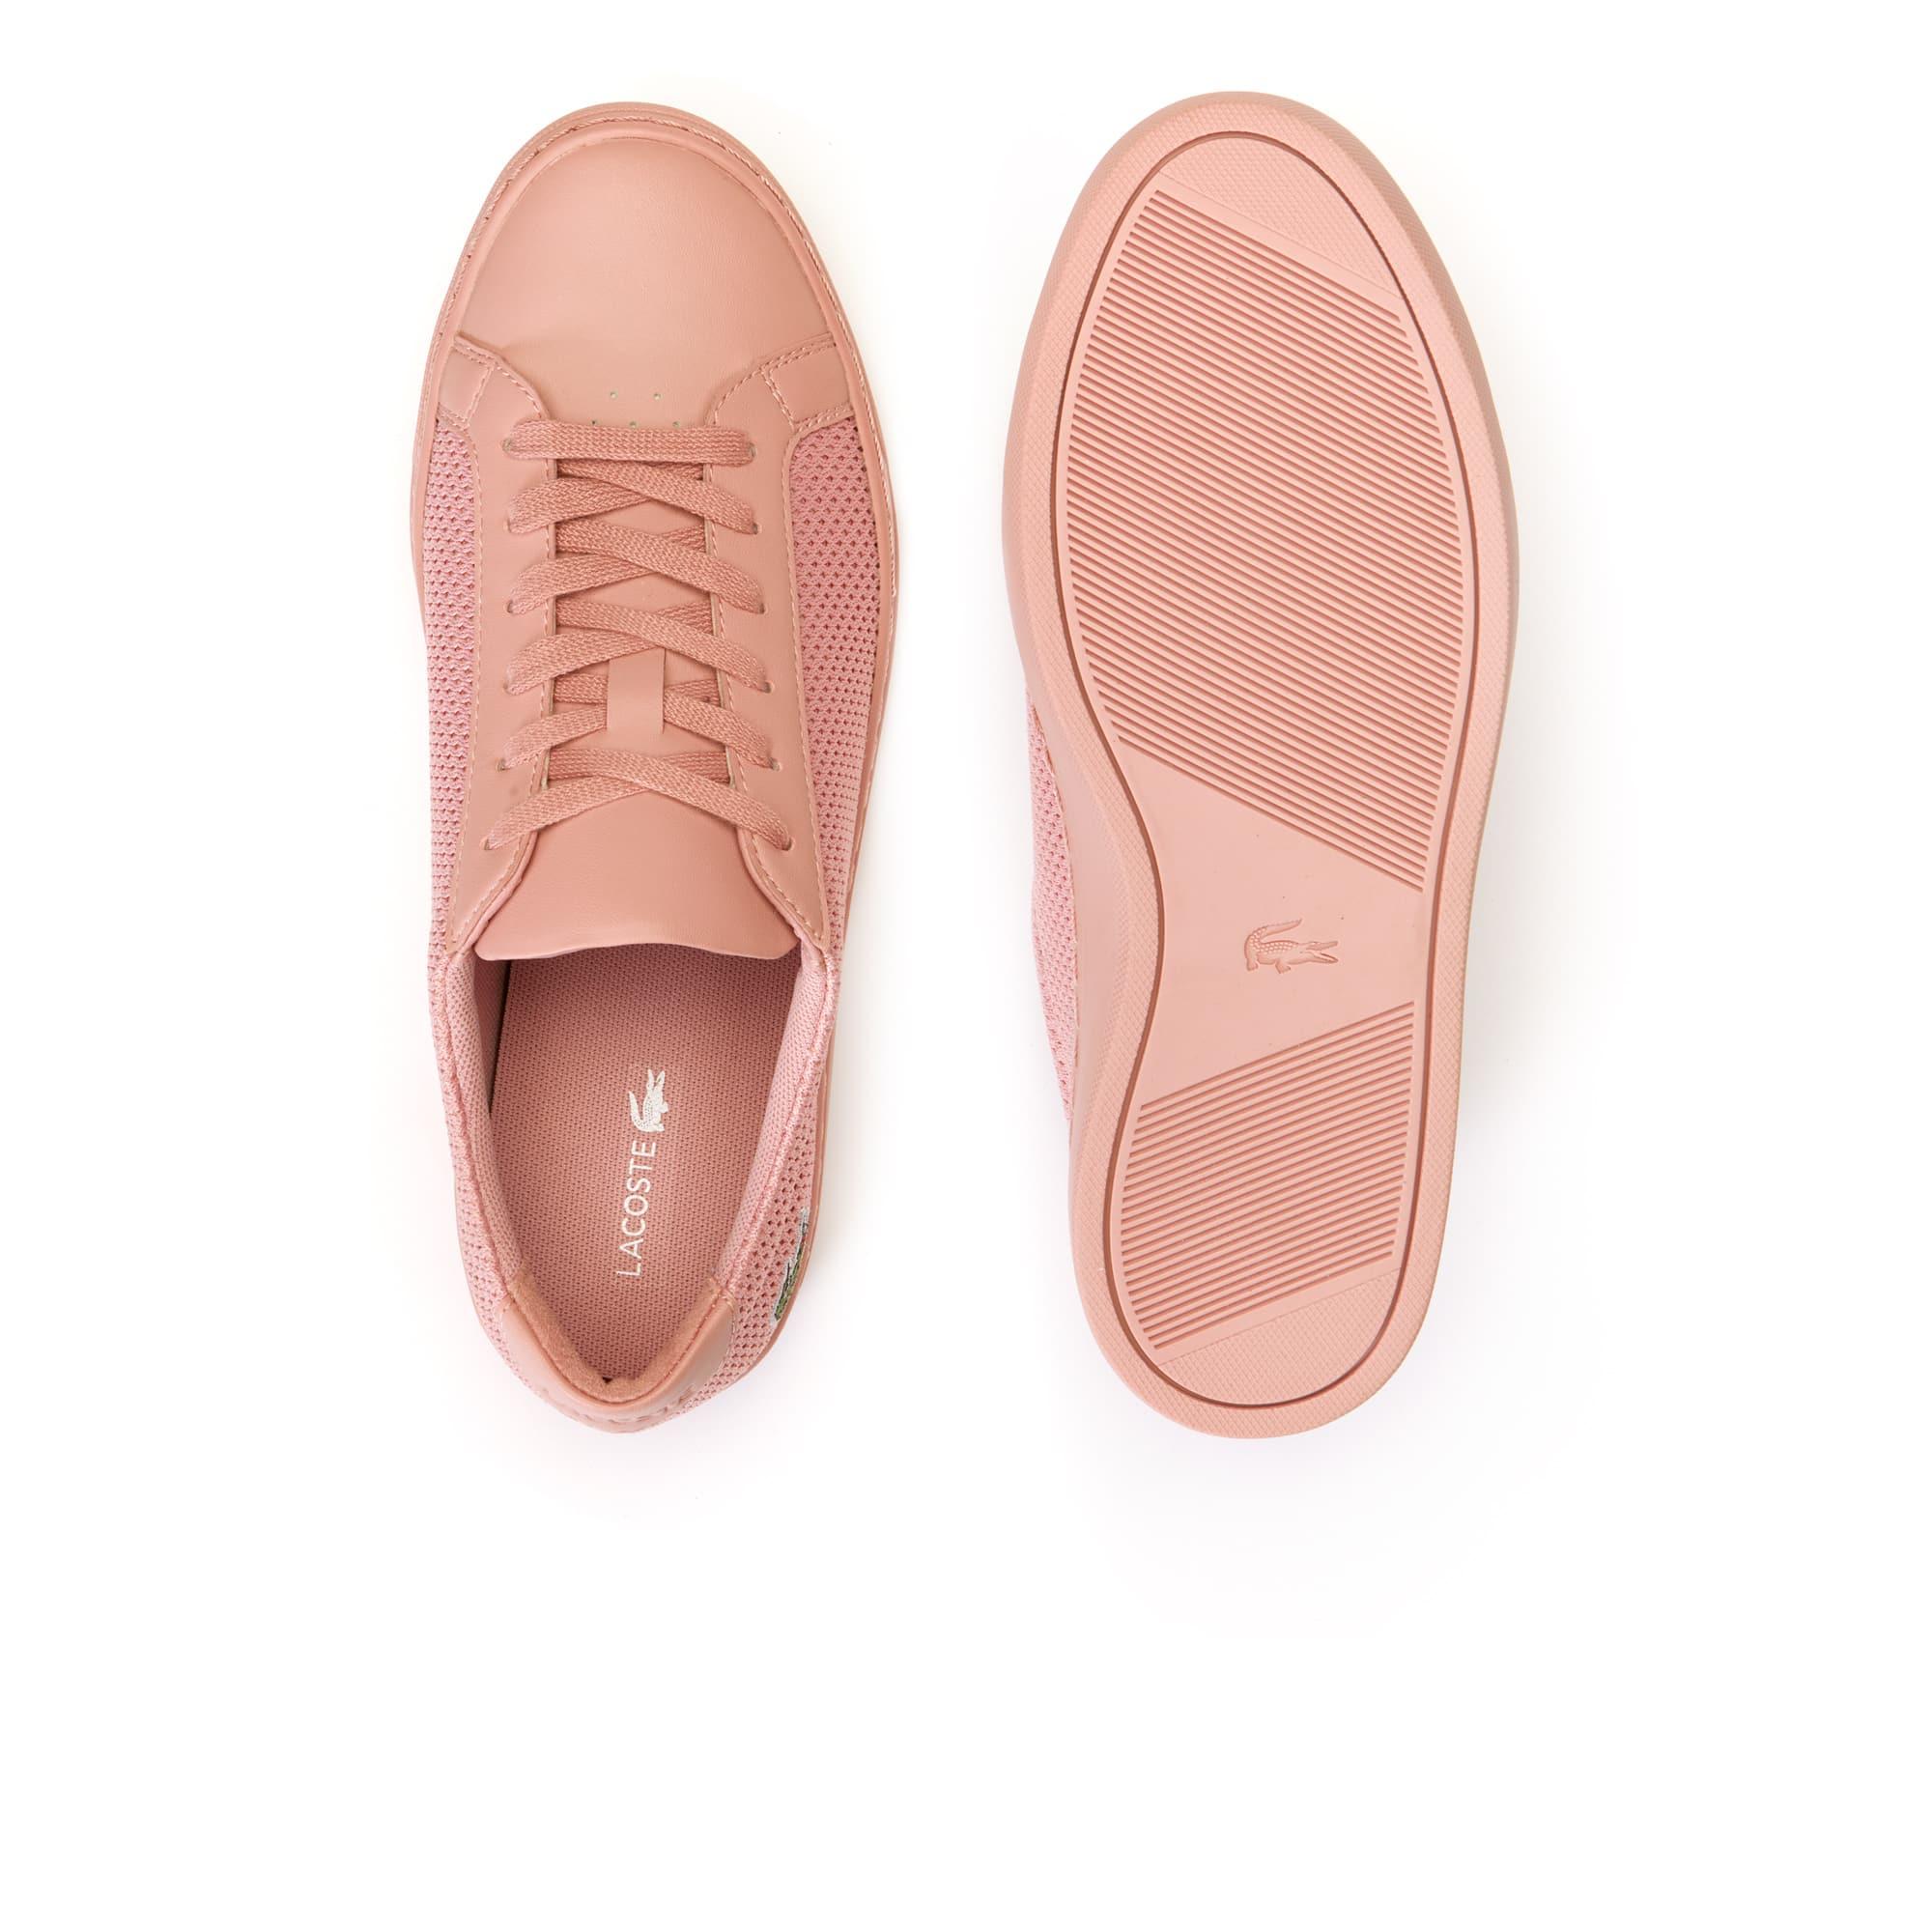 e810ed4485 Zapatillas de mujer L.12.12 Light-WT de material textil y piel